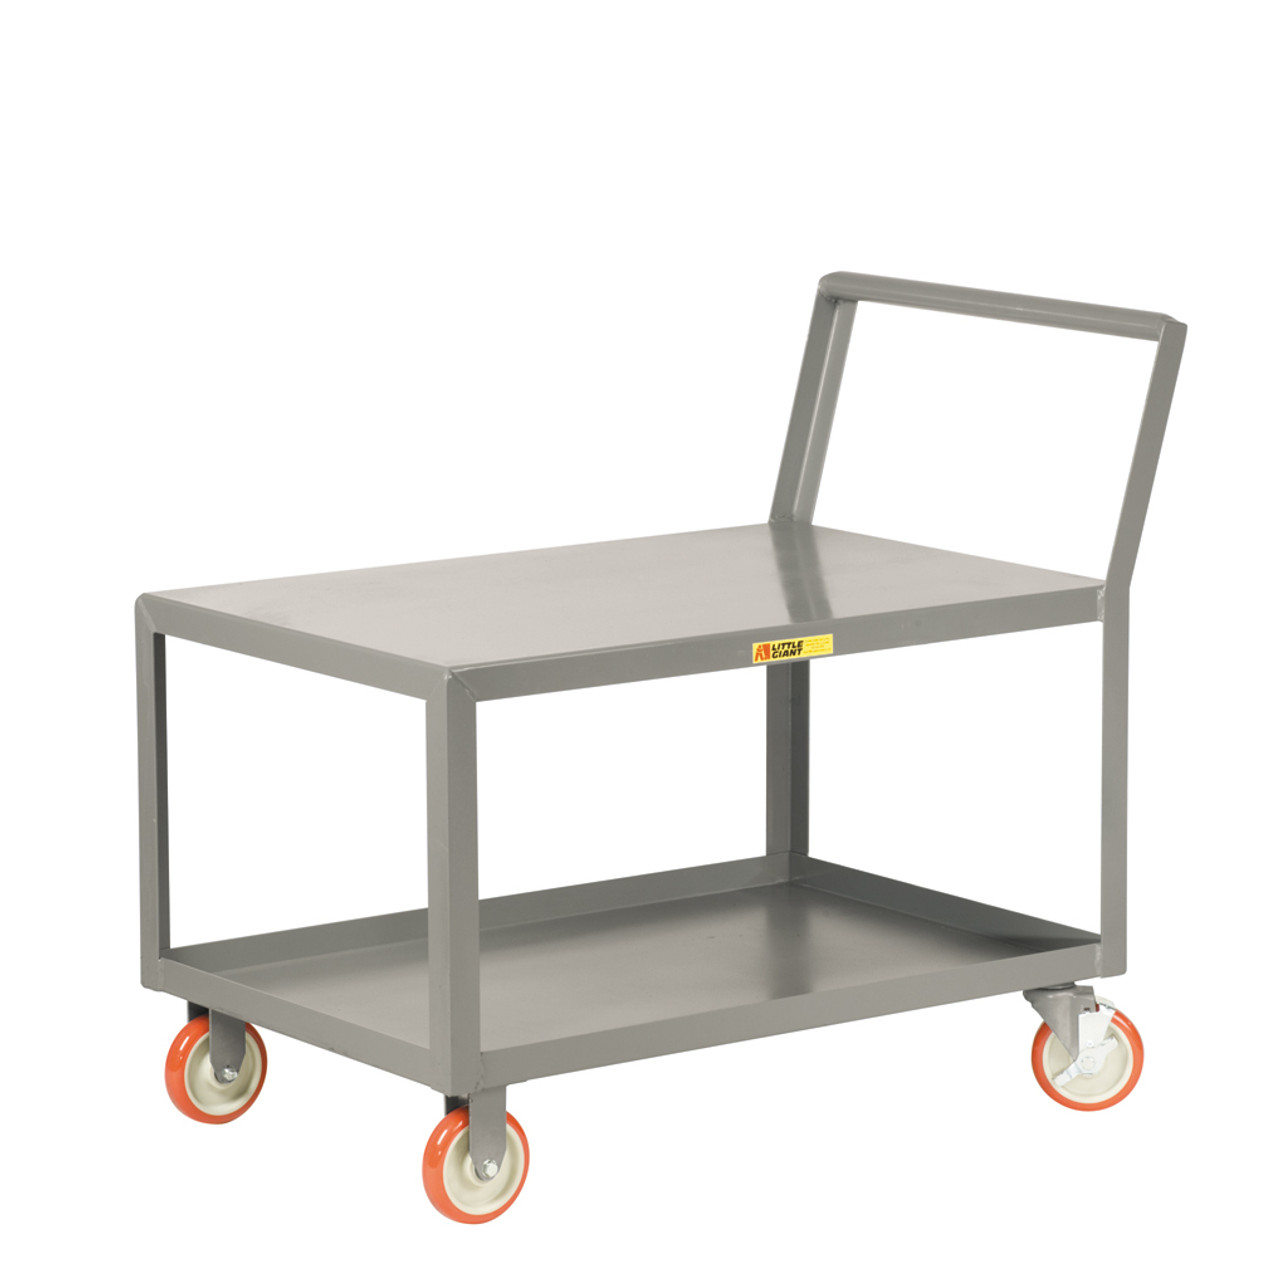 Low Deck Shelf Truck - Sloped Handle